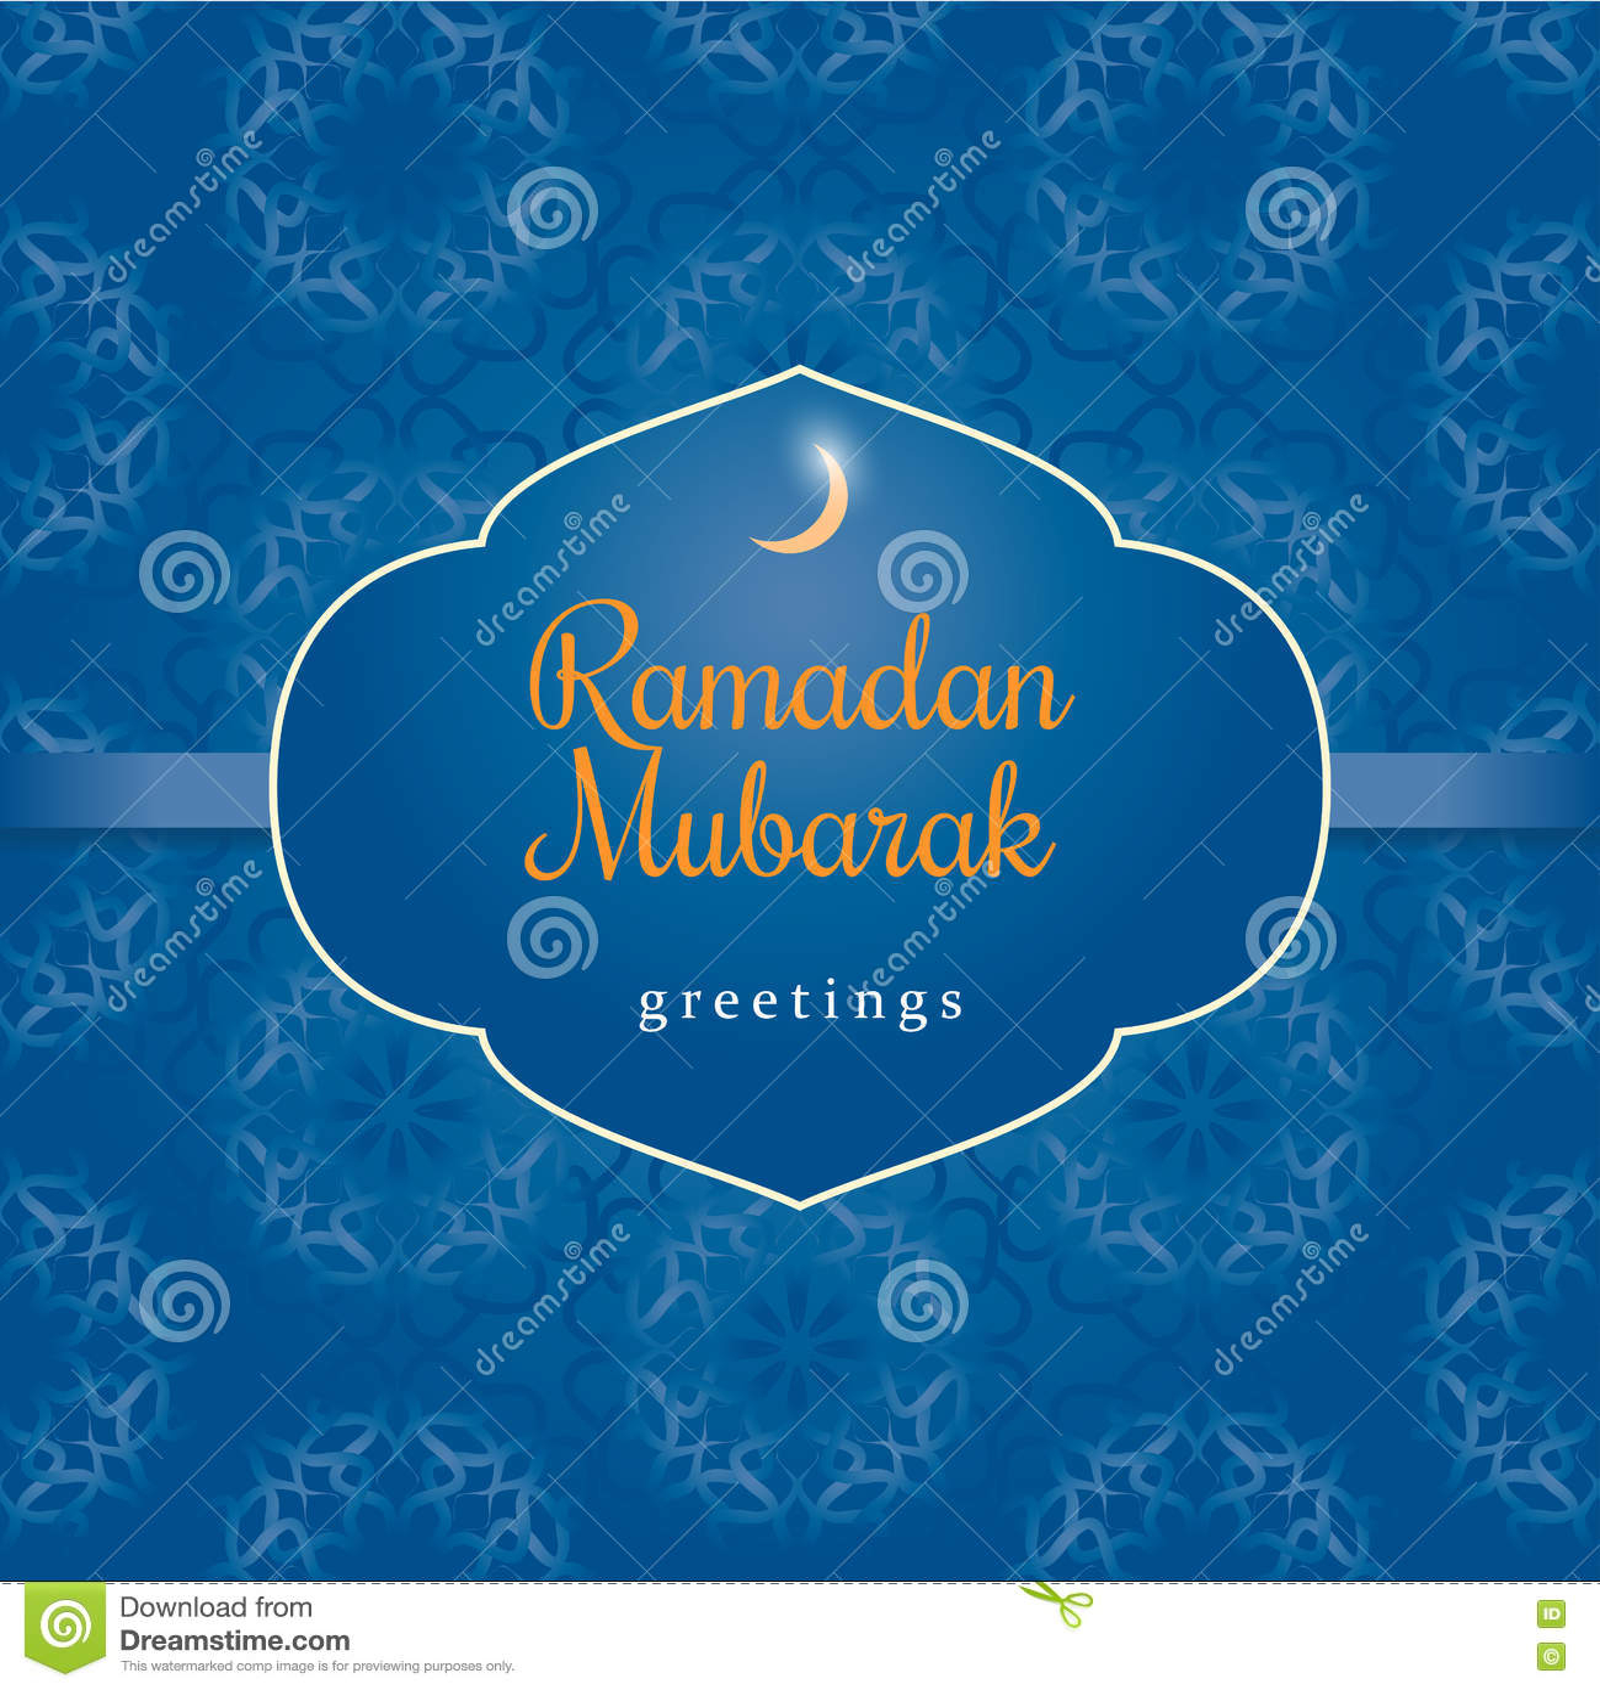 Ramadan greetings background ramadan stock vector illustration of ramadan greetings background ramadan kristyandbryce Image collections